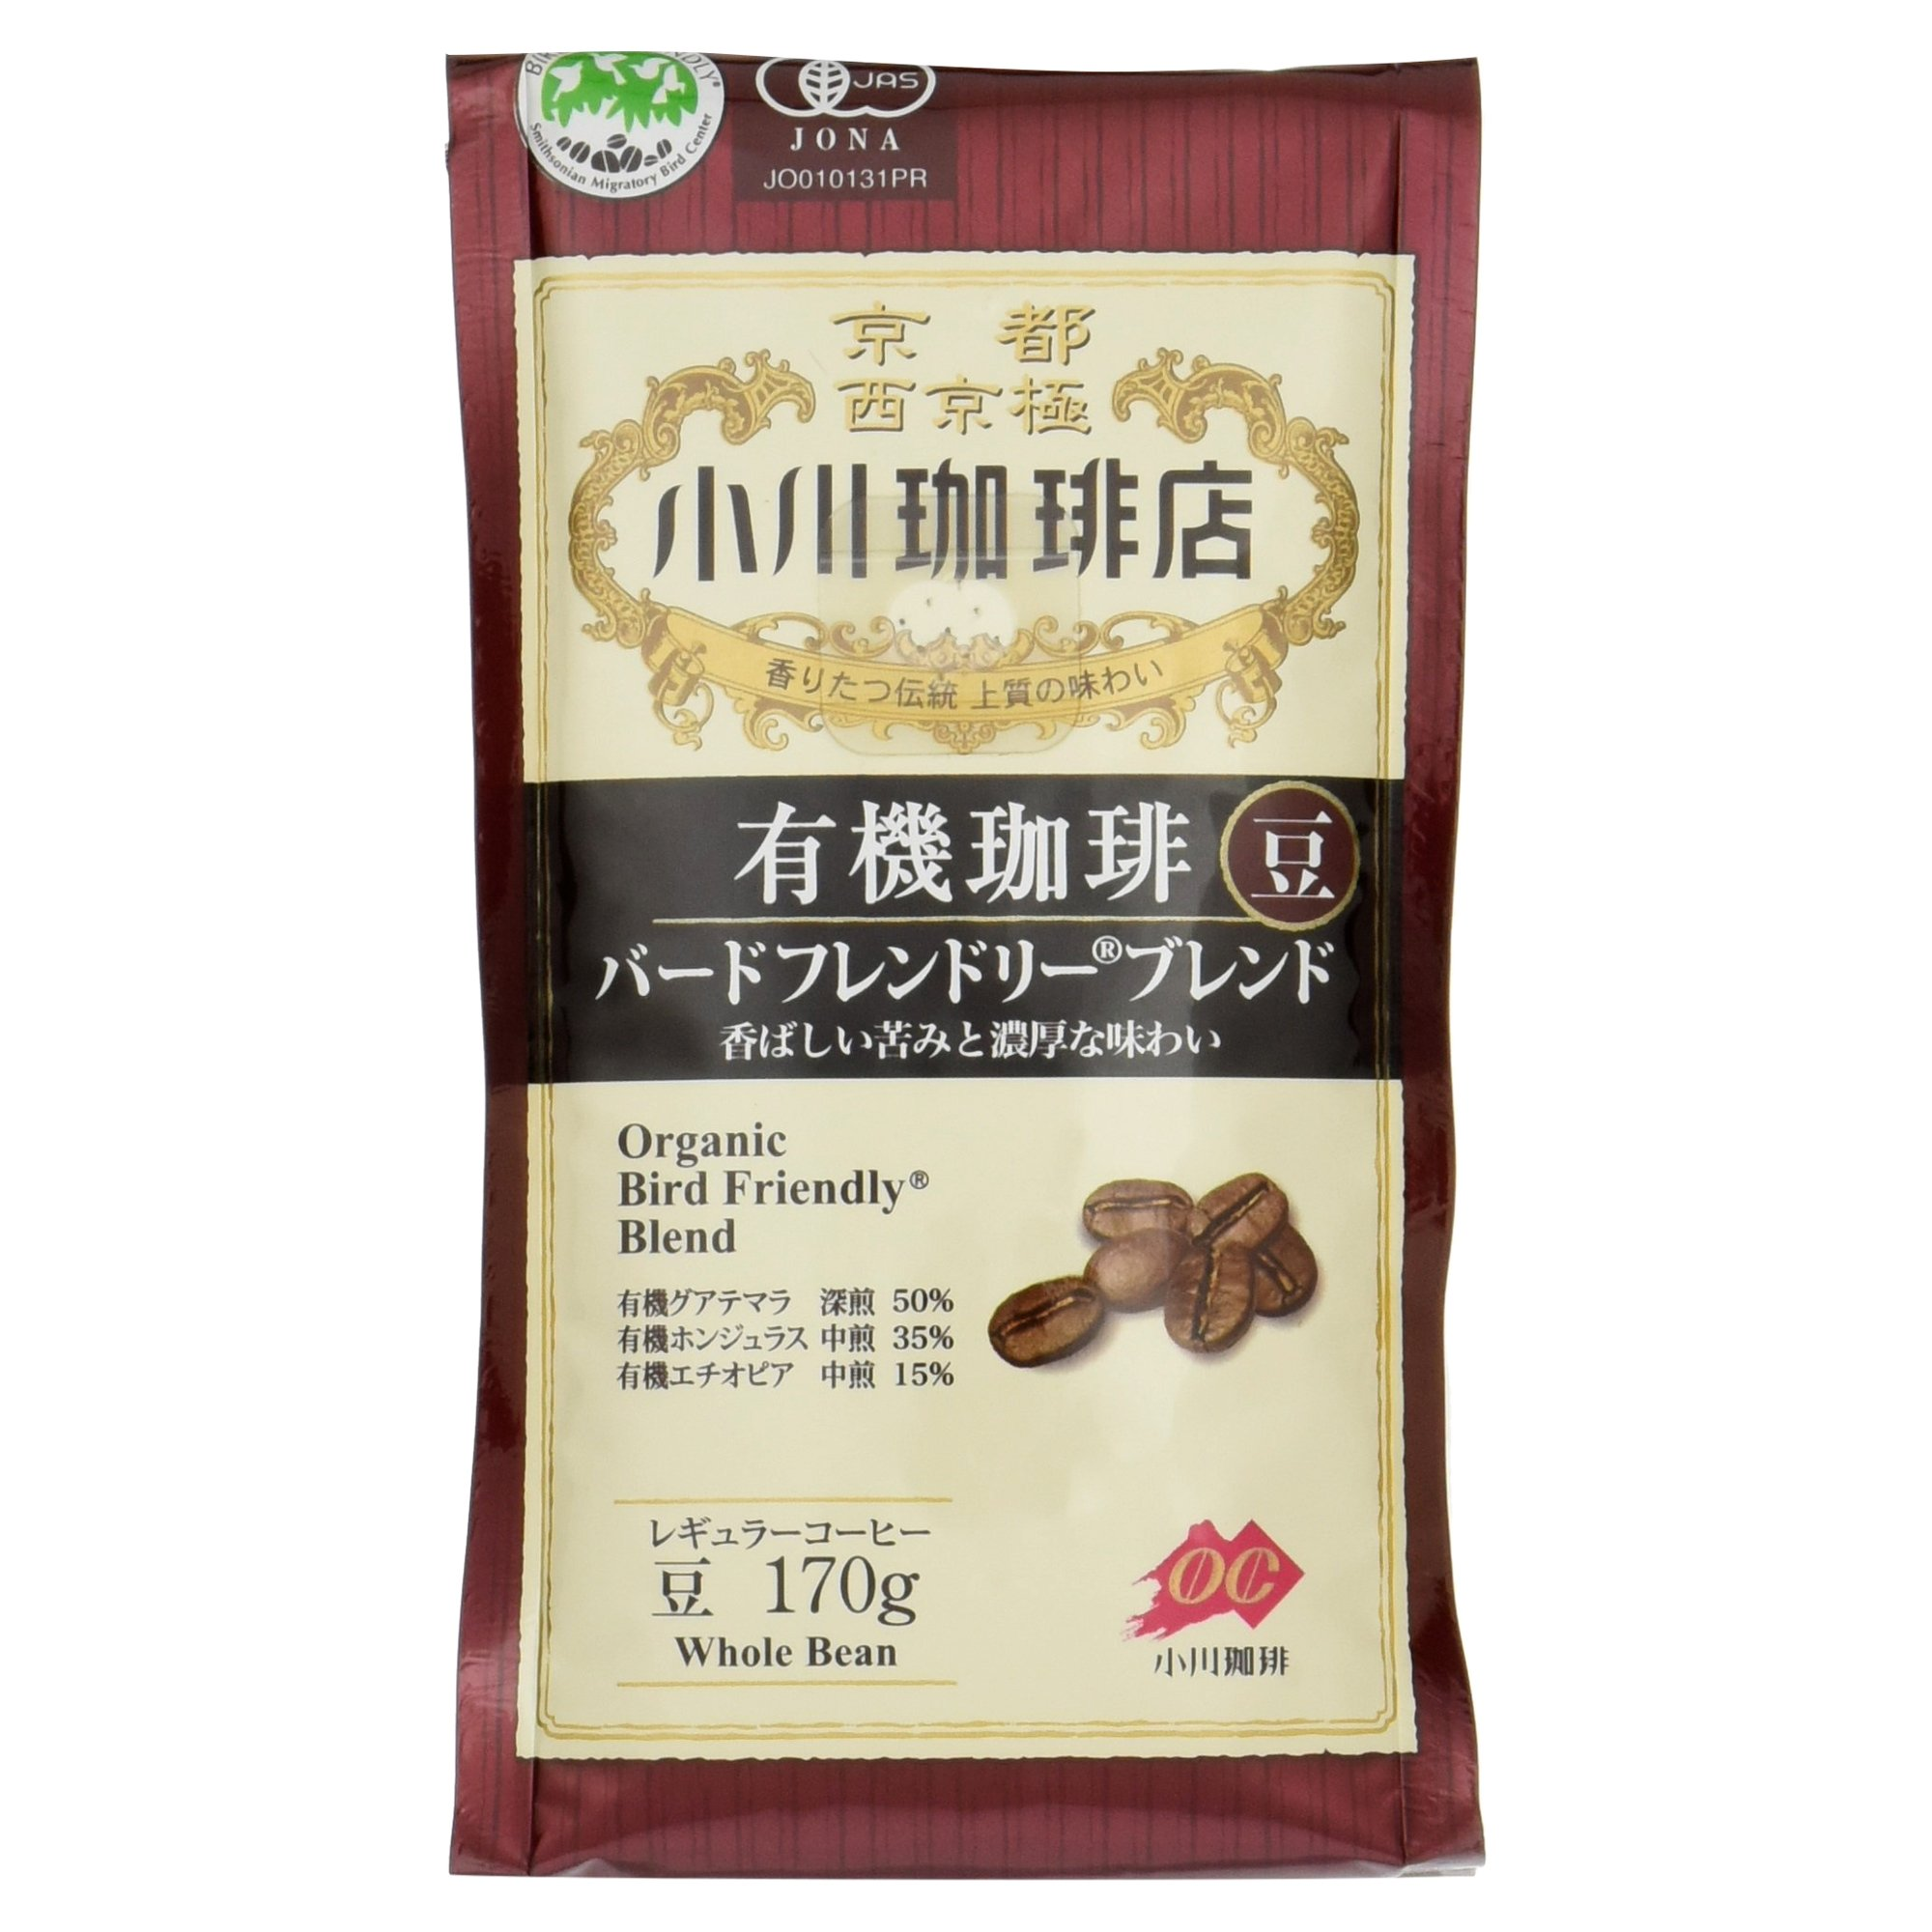 Ogawa Coffee shop organic coffee Bird-friendly blend beans 170g